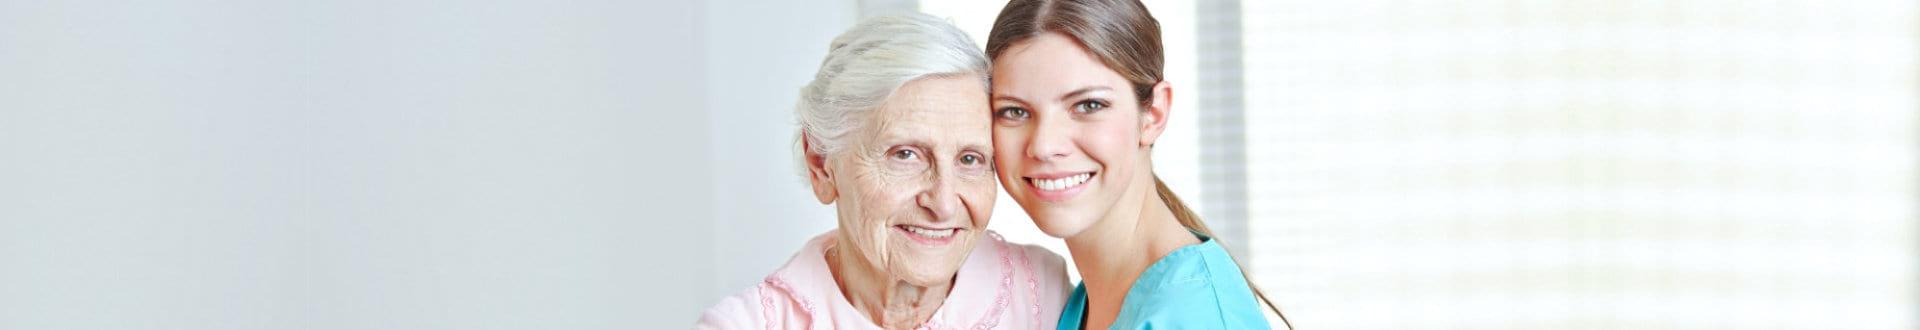 senior and nurse smiling